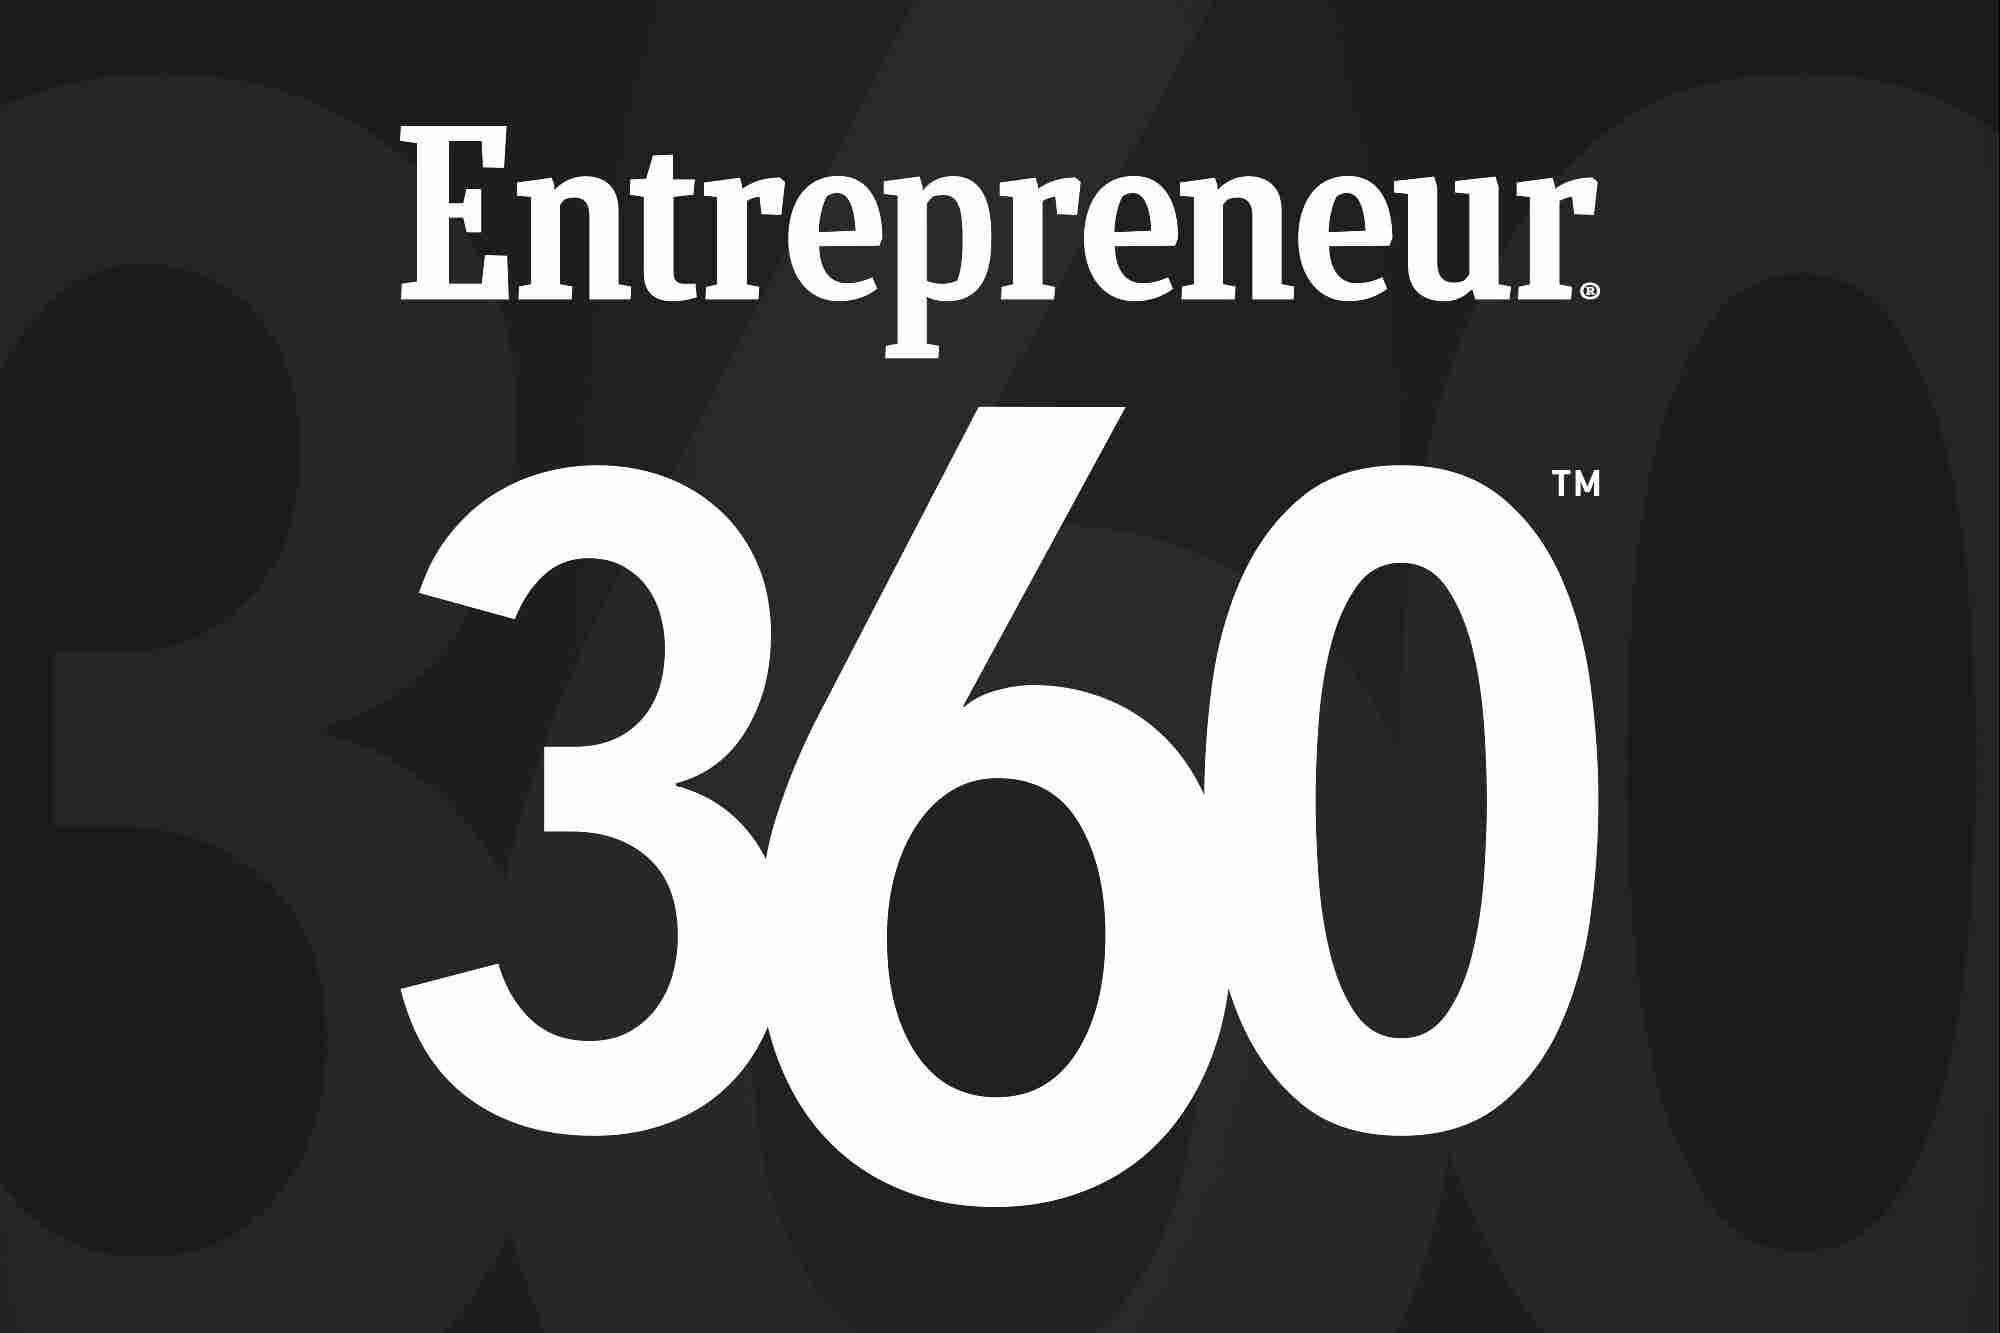 Entrepreneur India Launches Entrepreneur 360!